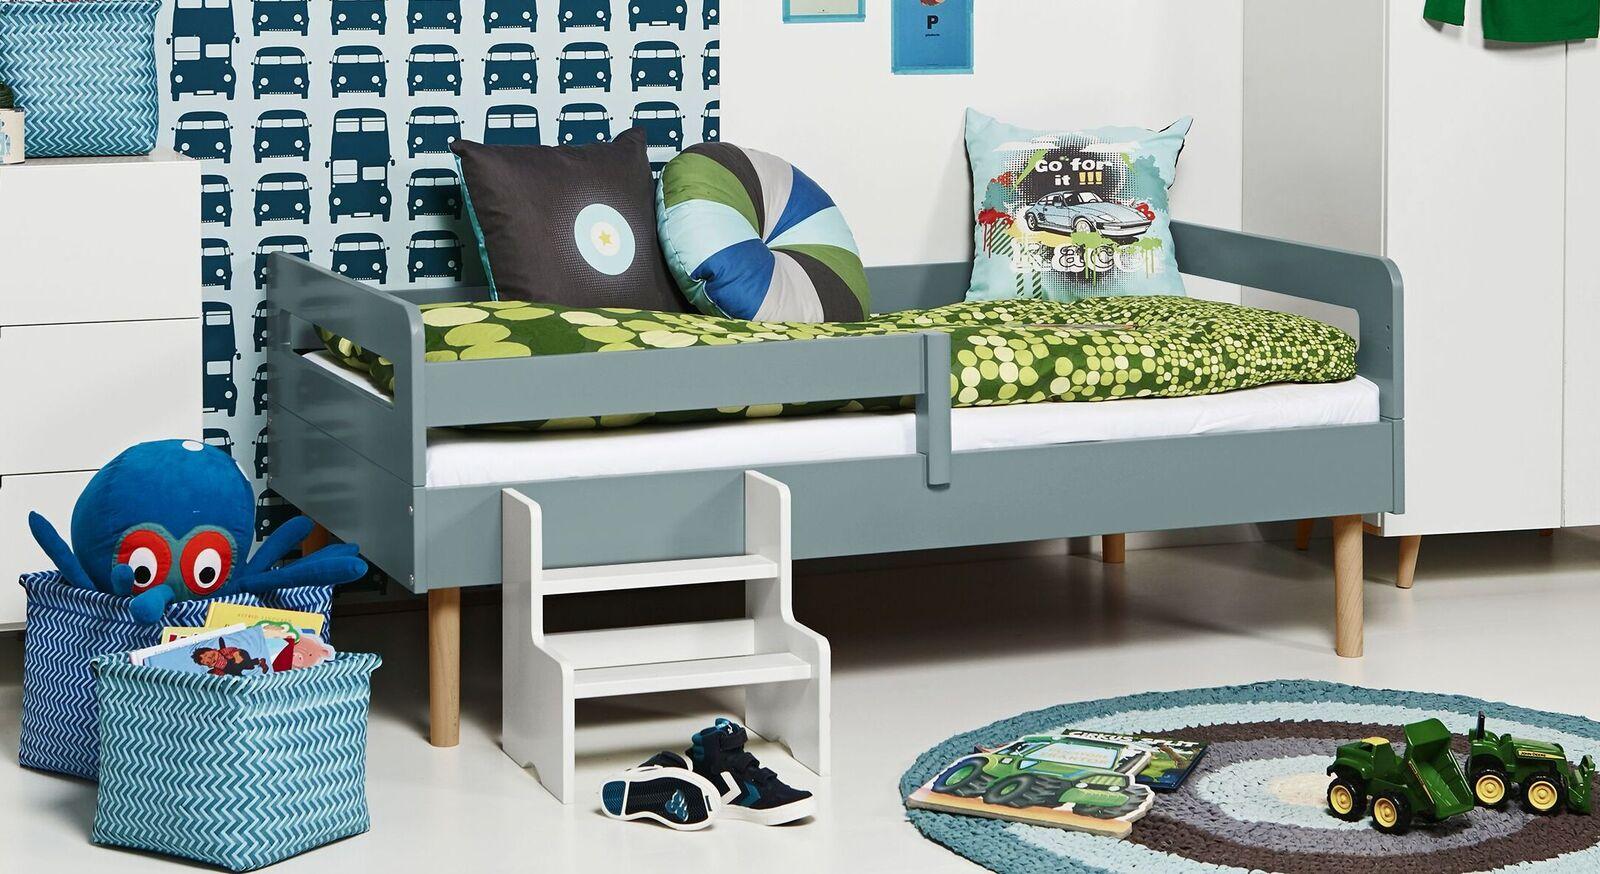 Modernes Kinderbett Kids Town Retro aus blaugrauem MDF